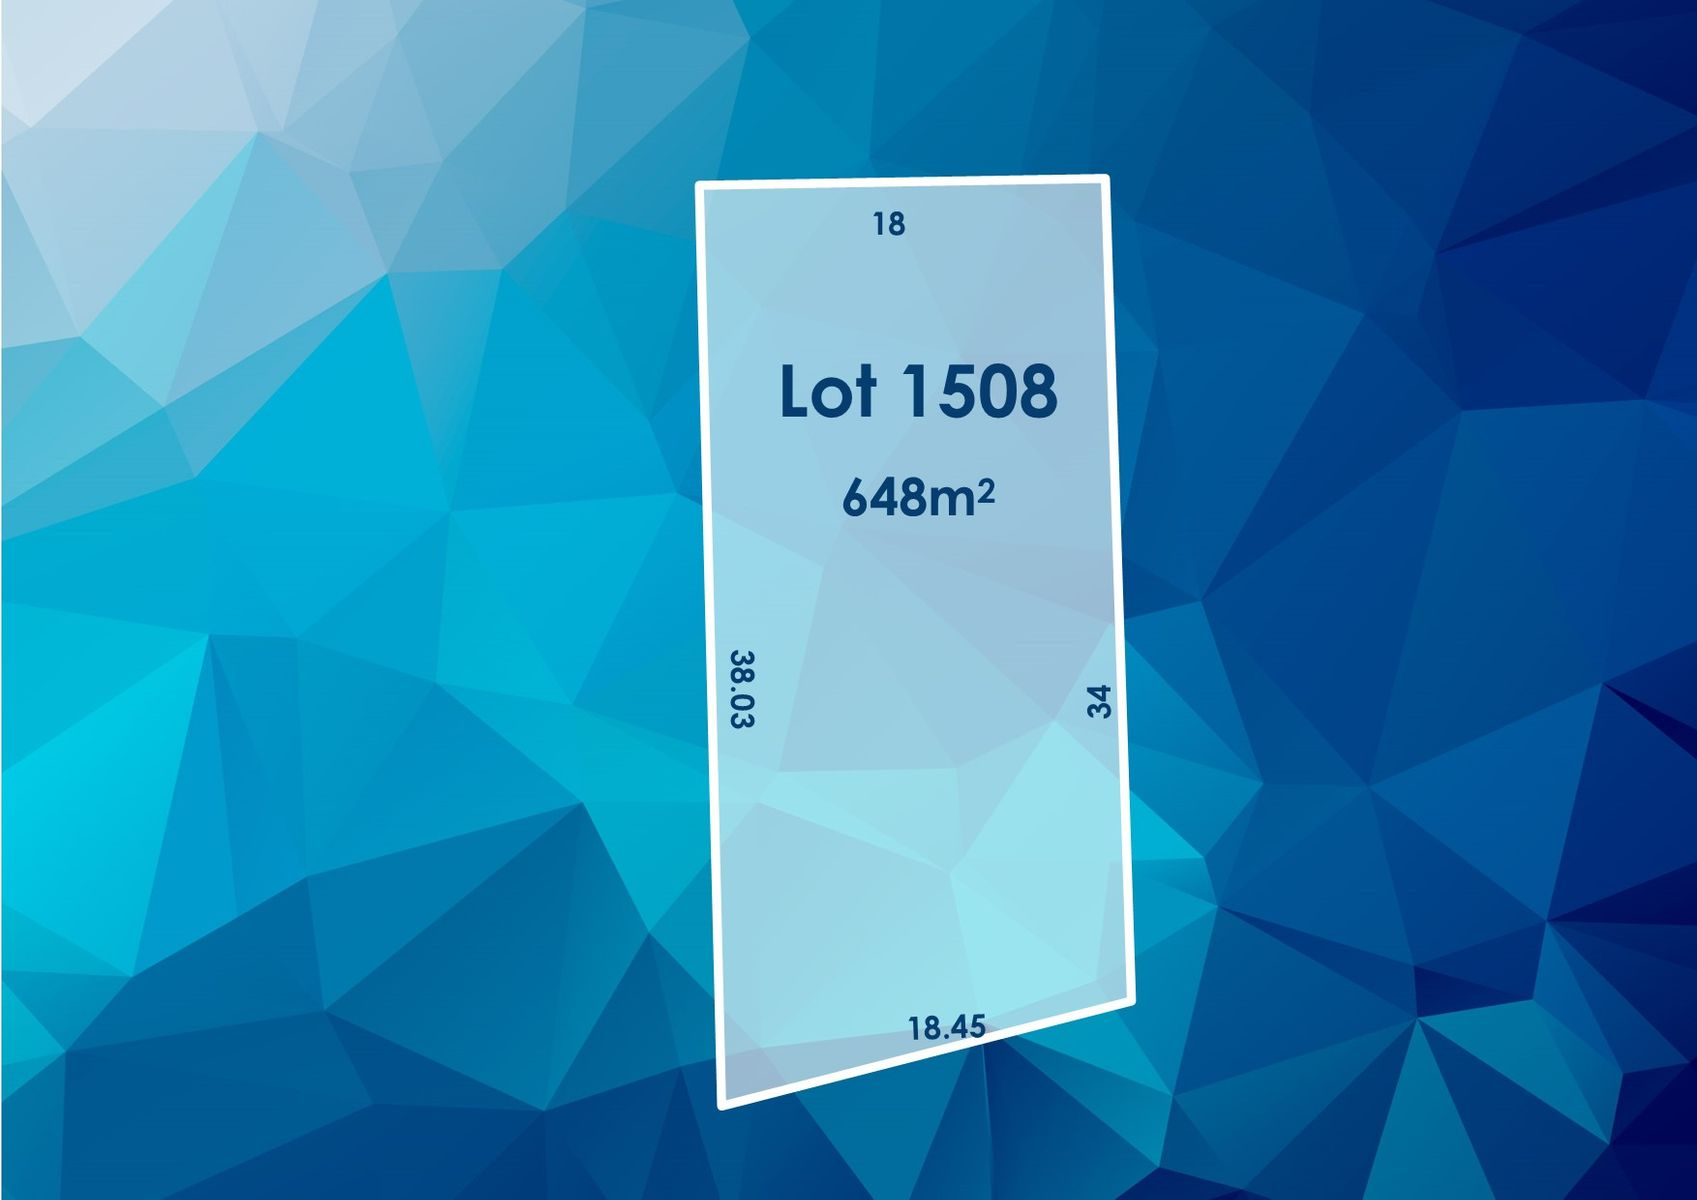 Lot 1508 Tranquil Street, Strathfieldsaye, VIC 3551